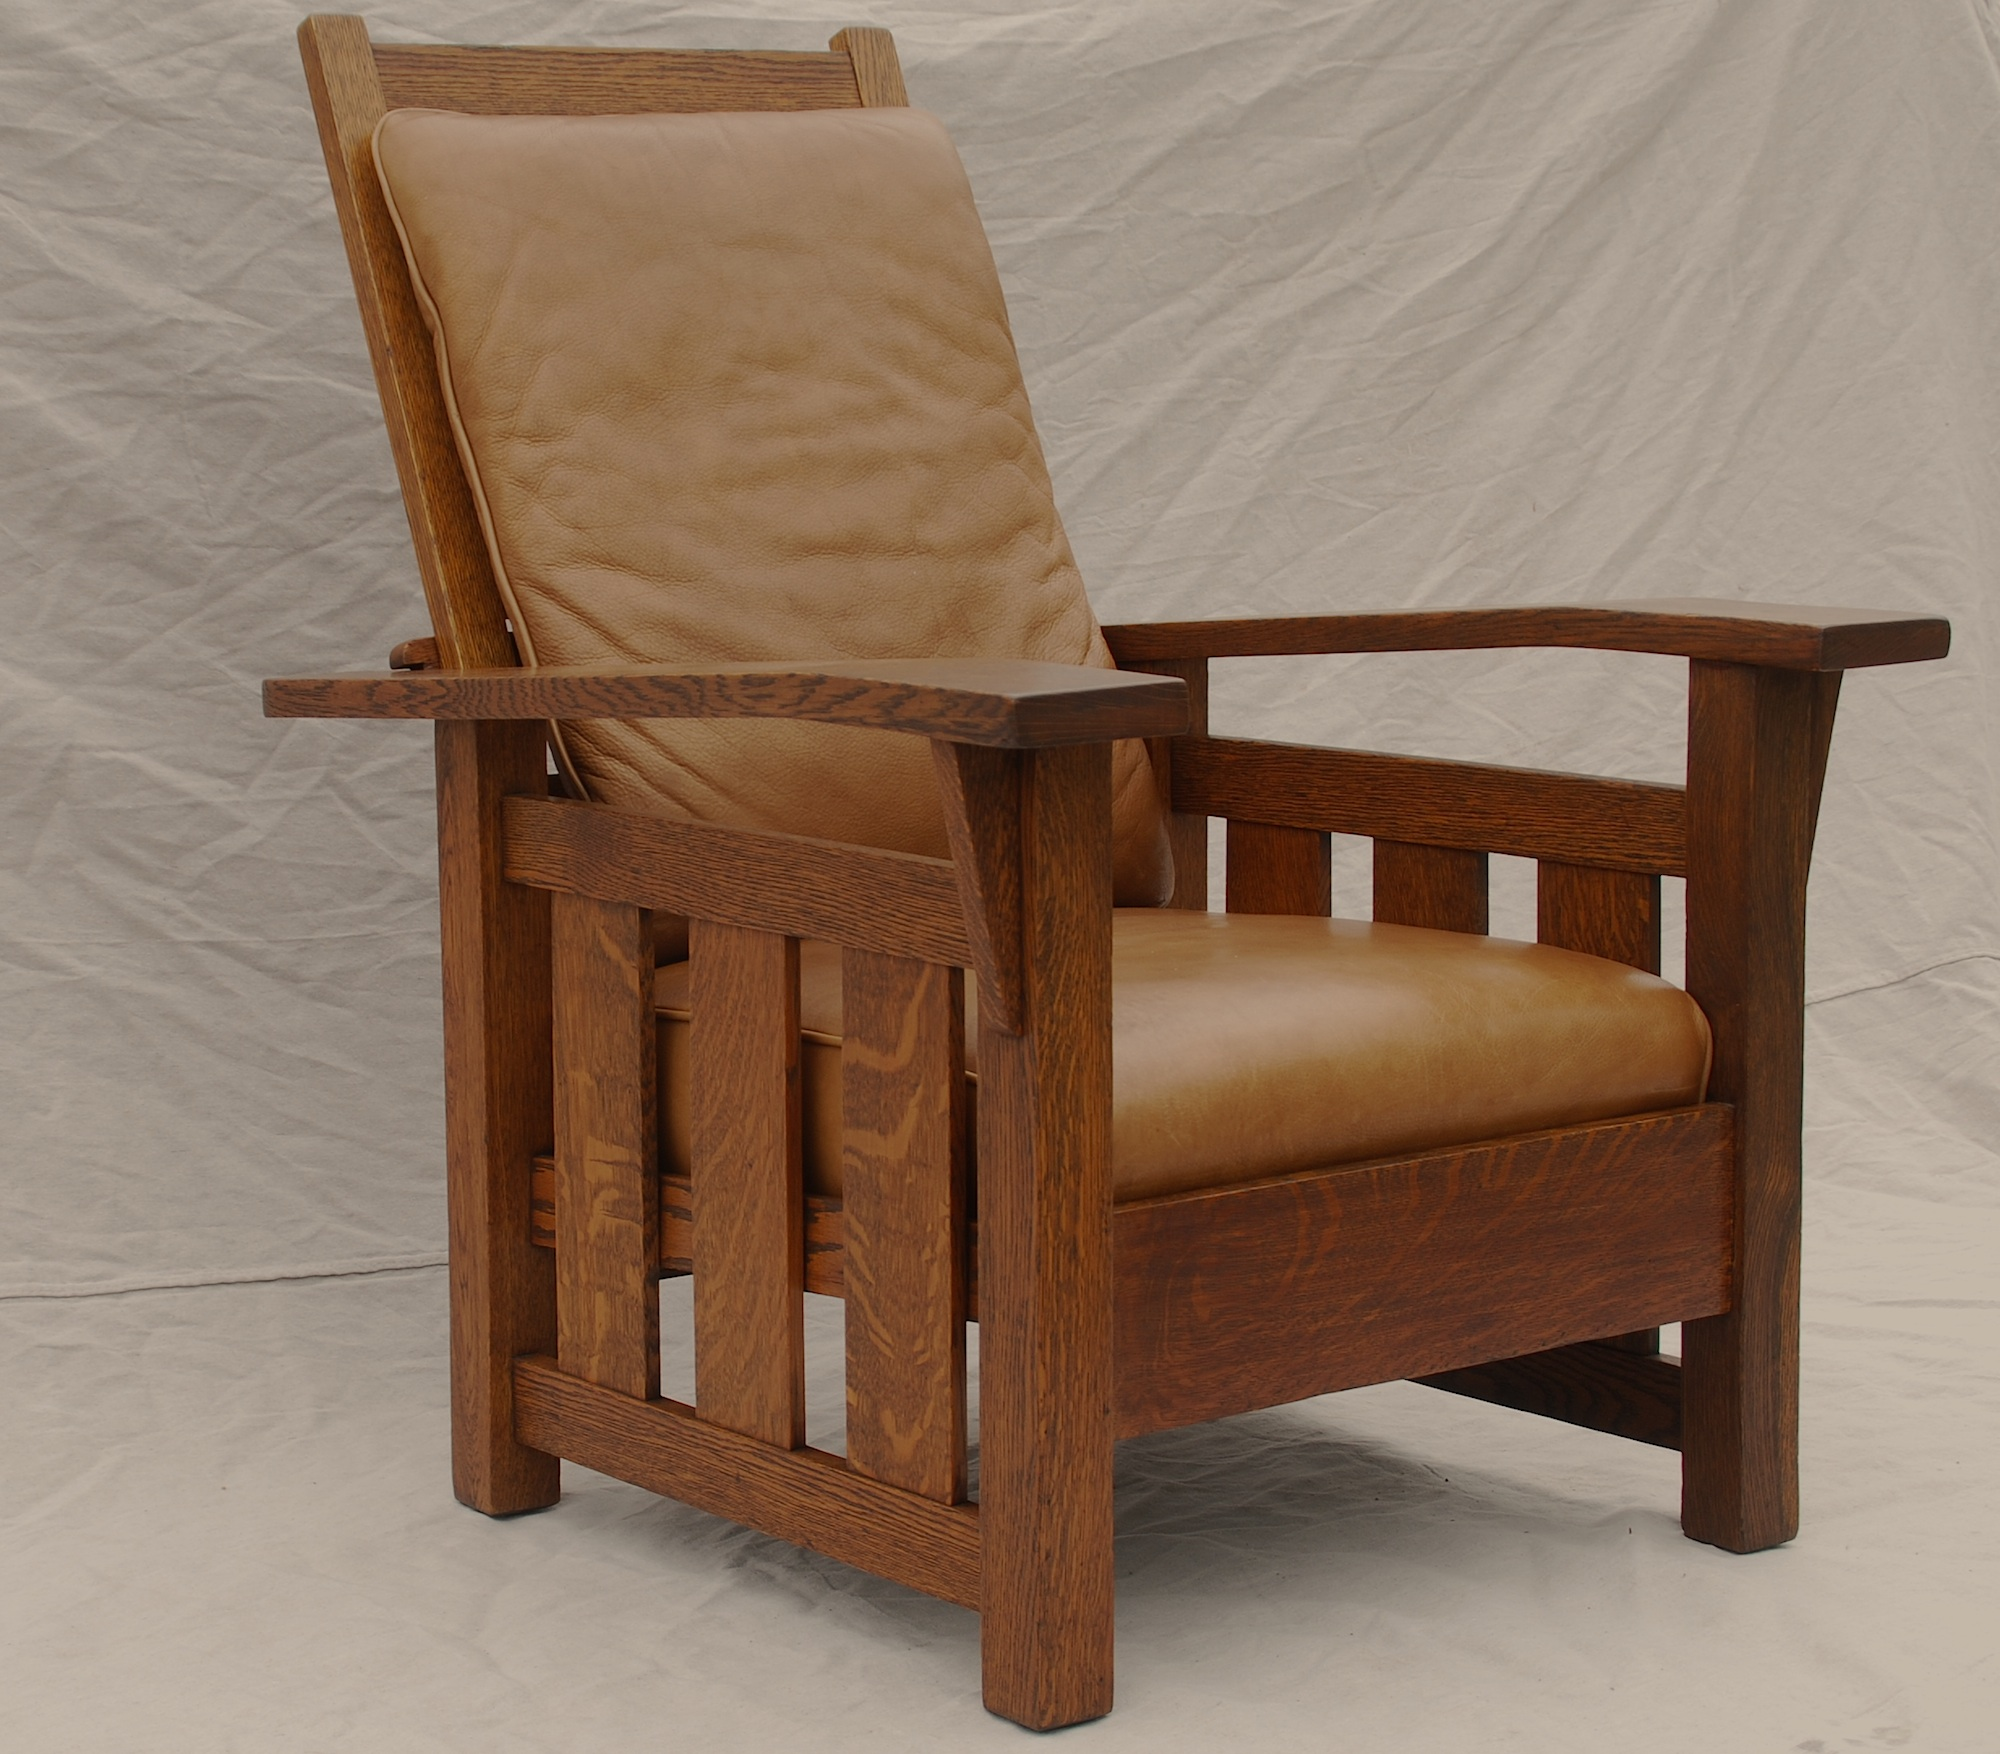 Stickley Era Quaint Art Slant Arm Morris Chair With Leather Cushions.